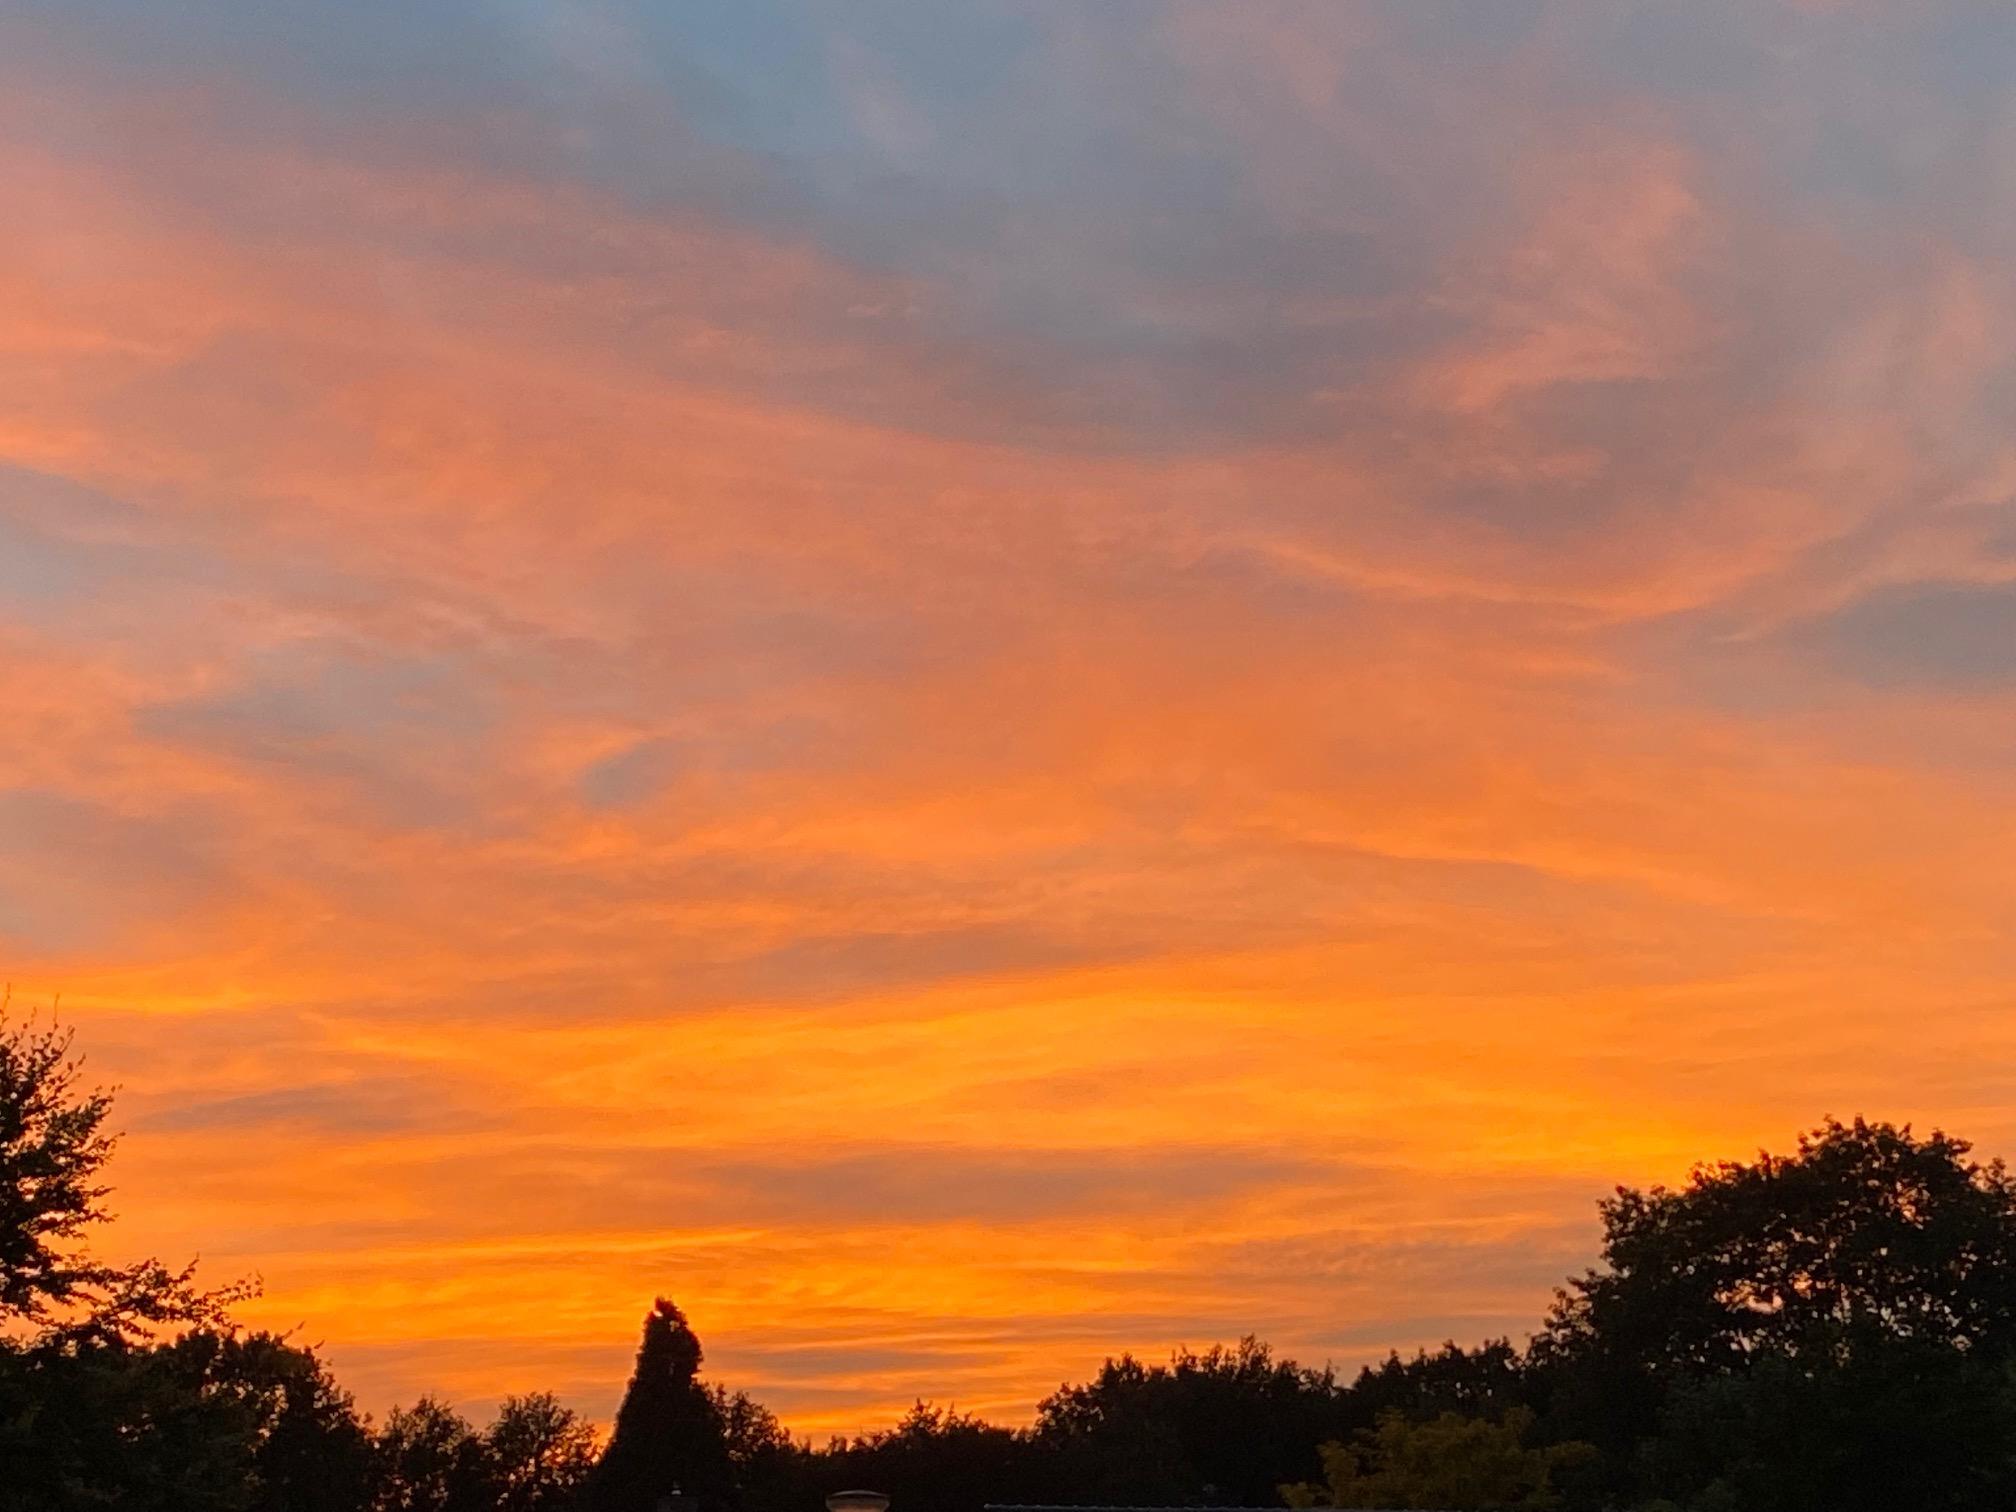 Fraaie zonsondergang te Montfort vanavond